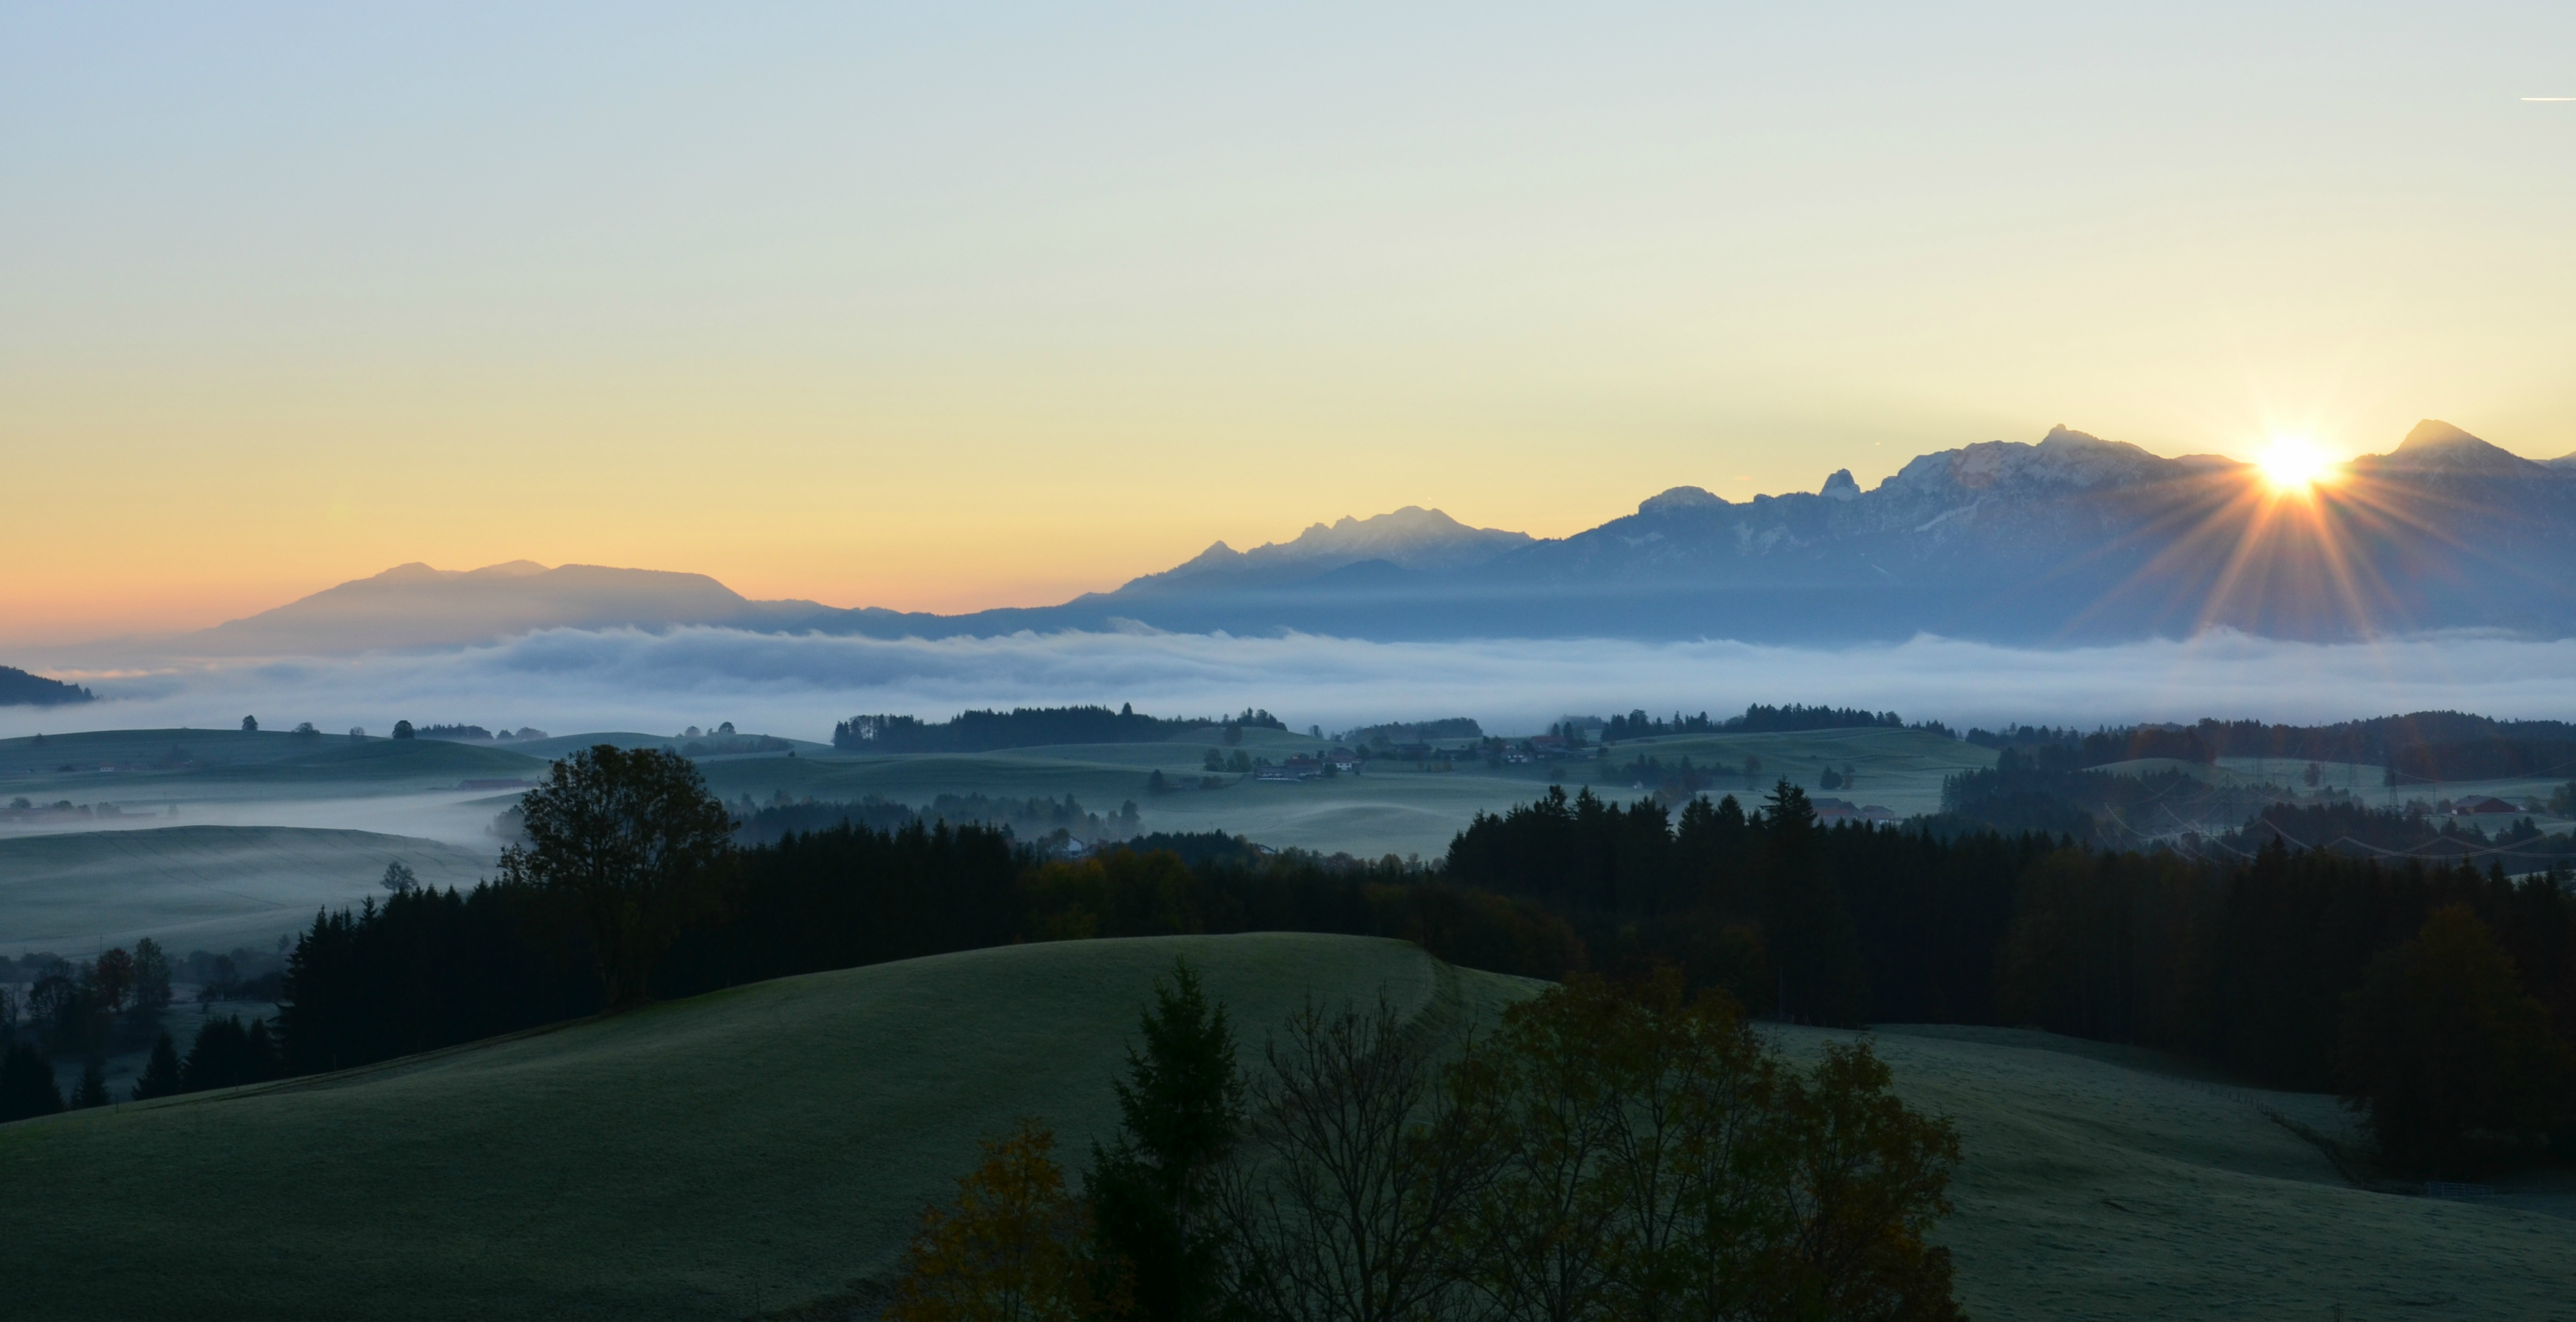 H0125_Sonnenaufgang_Nebelmorgen_Oberdeusch_Füssener_Land.jpg